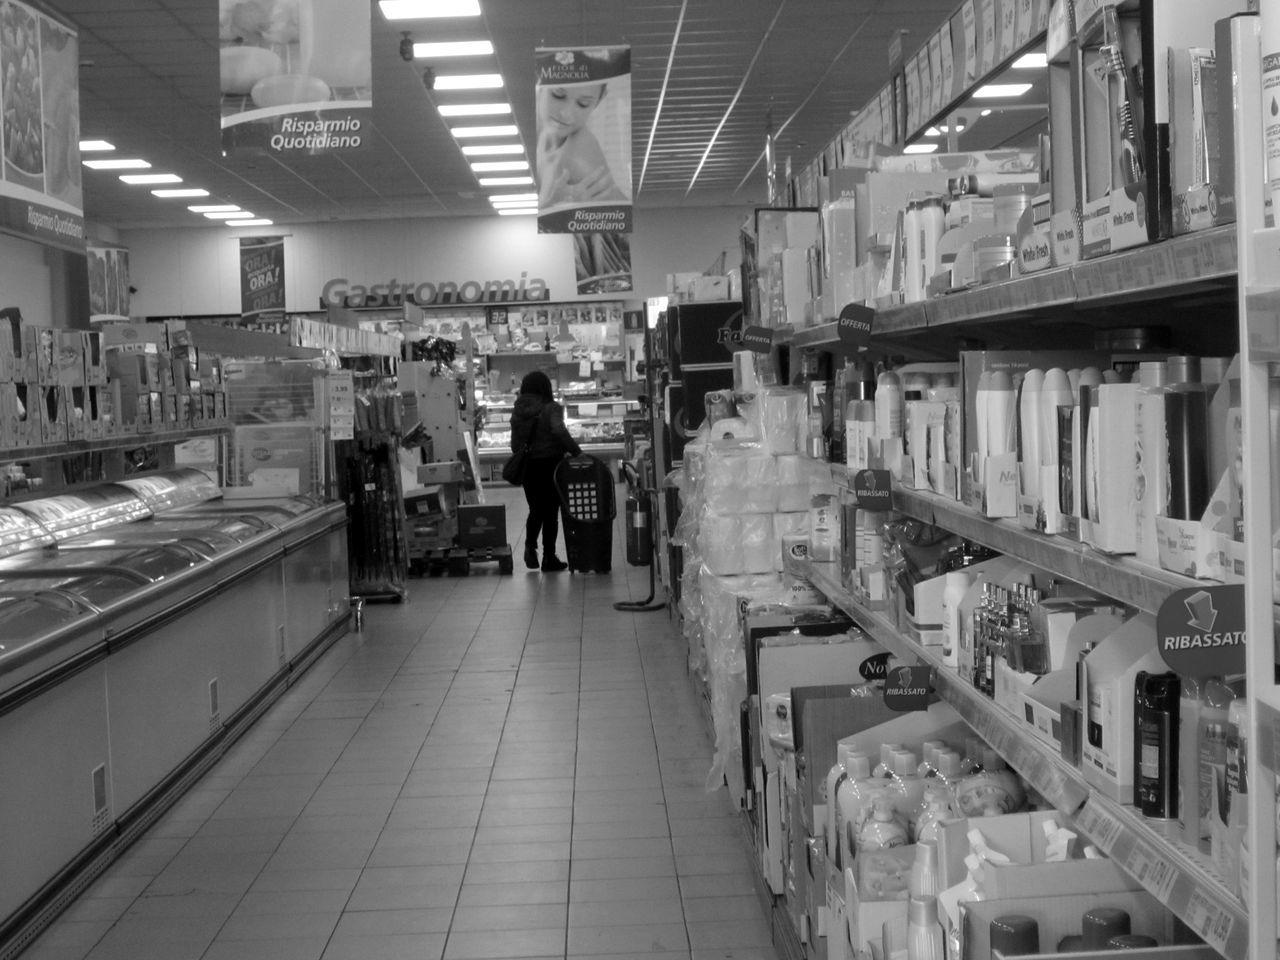 #basilicata #Black&White #blackandwhite #fotobiancoenero #fotobianconero #gallitello #Italia #italy #lucania #OldPicture #potenza #potenzainferiore #realtàquotidiana #supermarket#food#shopping #supermercato #urbanphotography